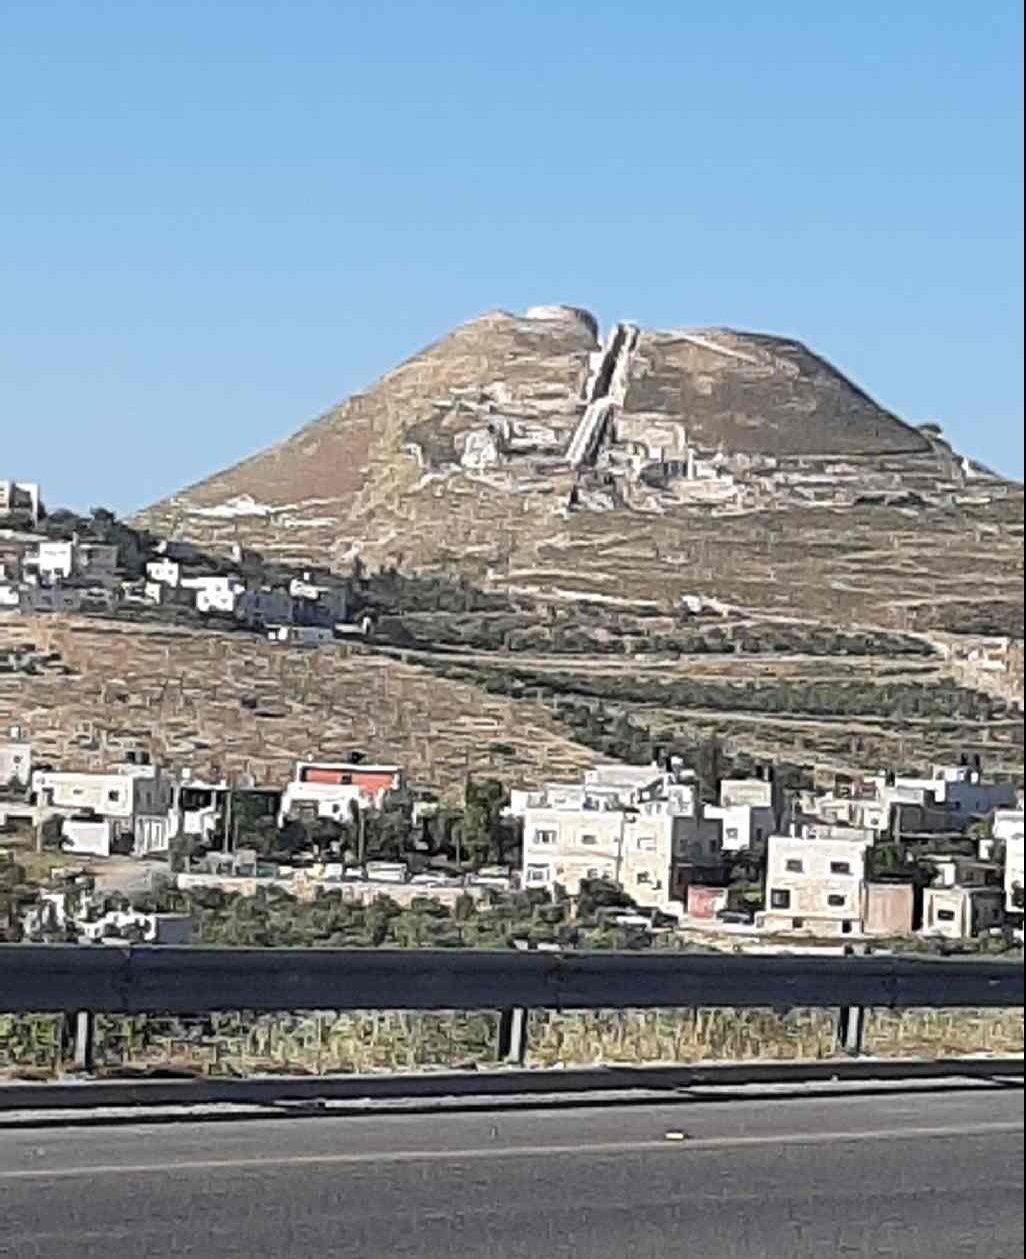 Herodium mountain viewed from road